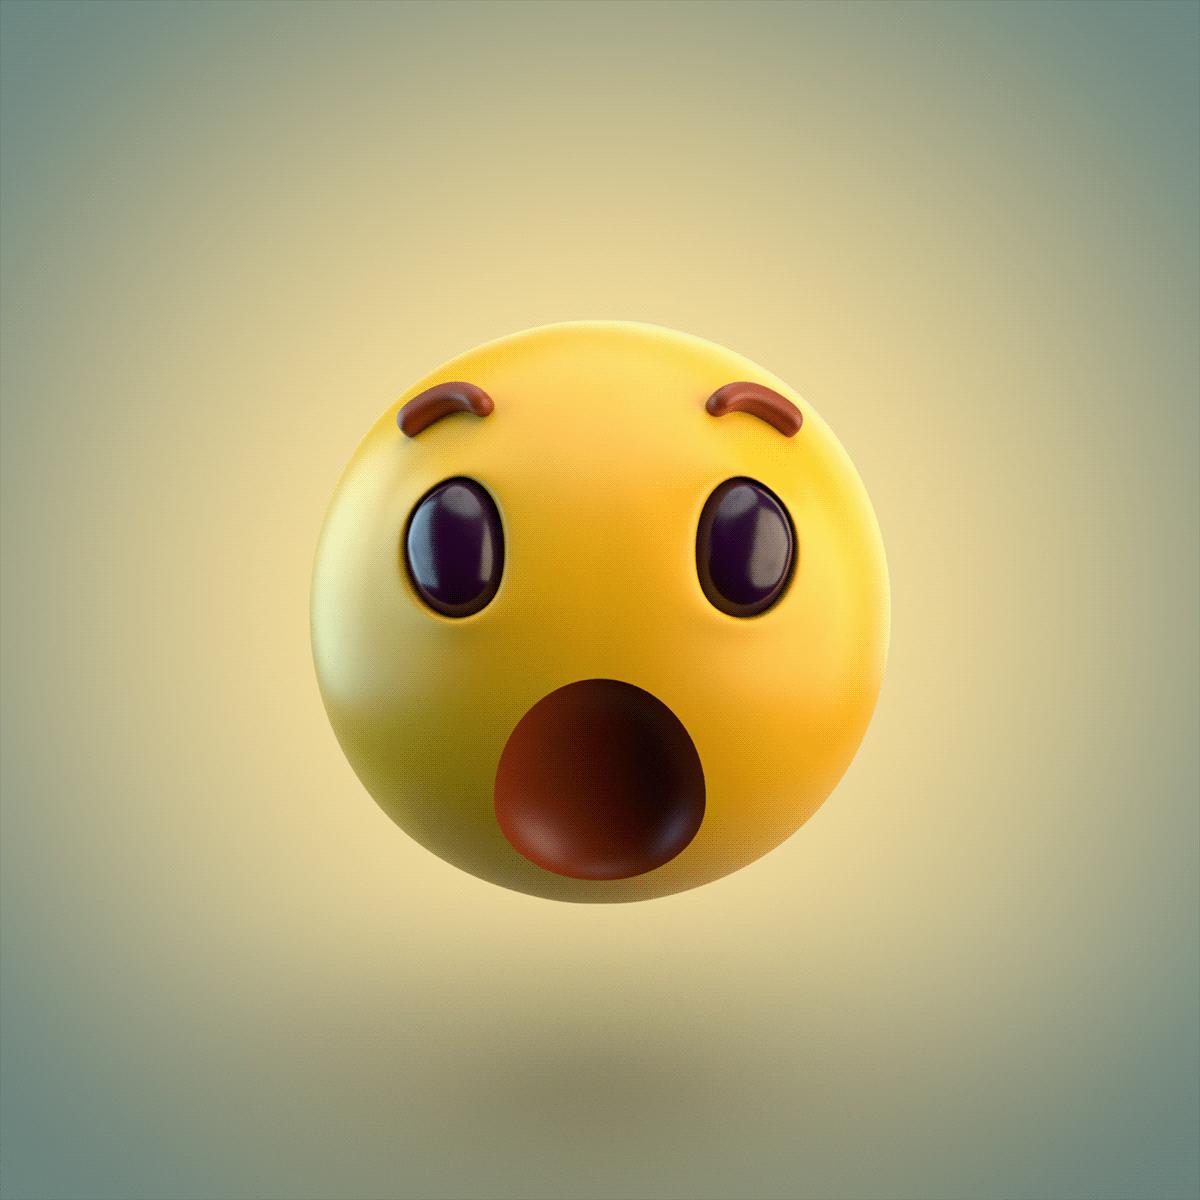 Wowsers Funny Emoji Faces Funny Emoticons Emoticons Emojis